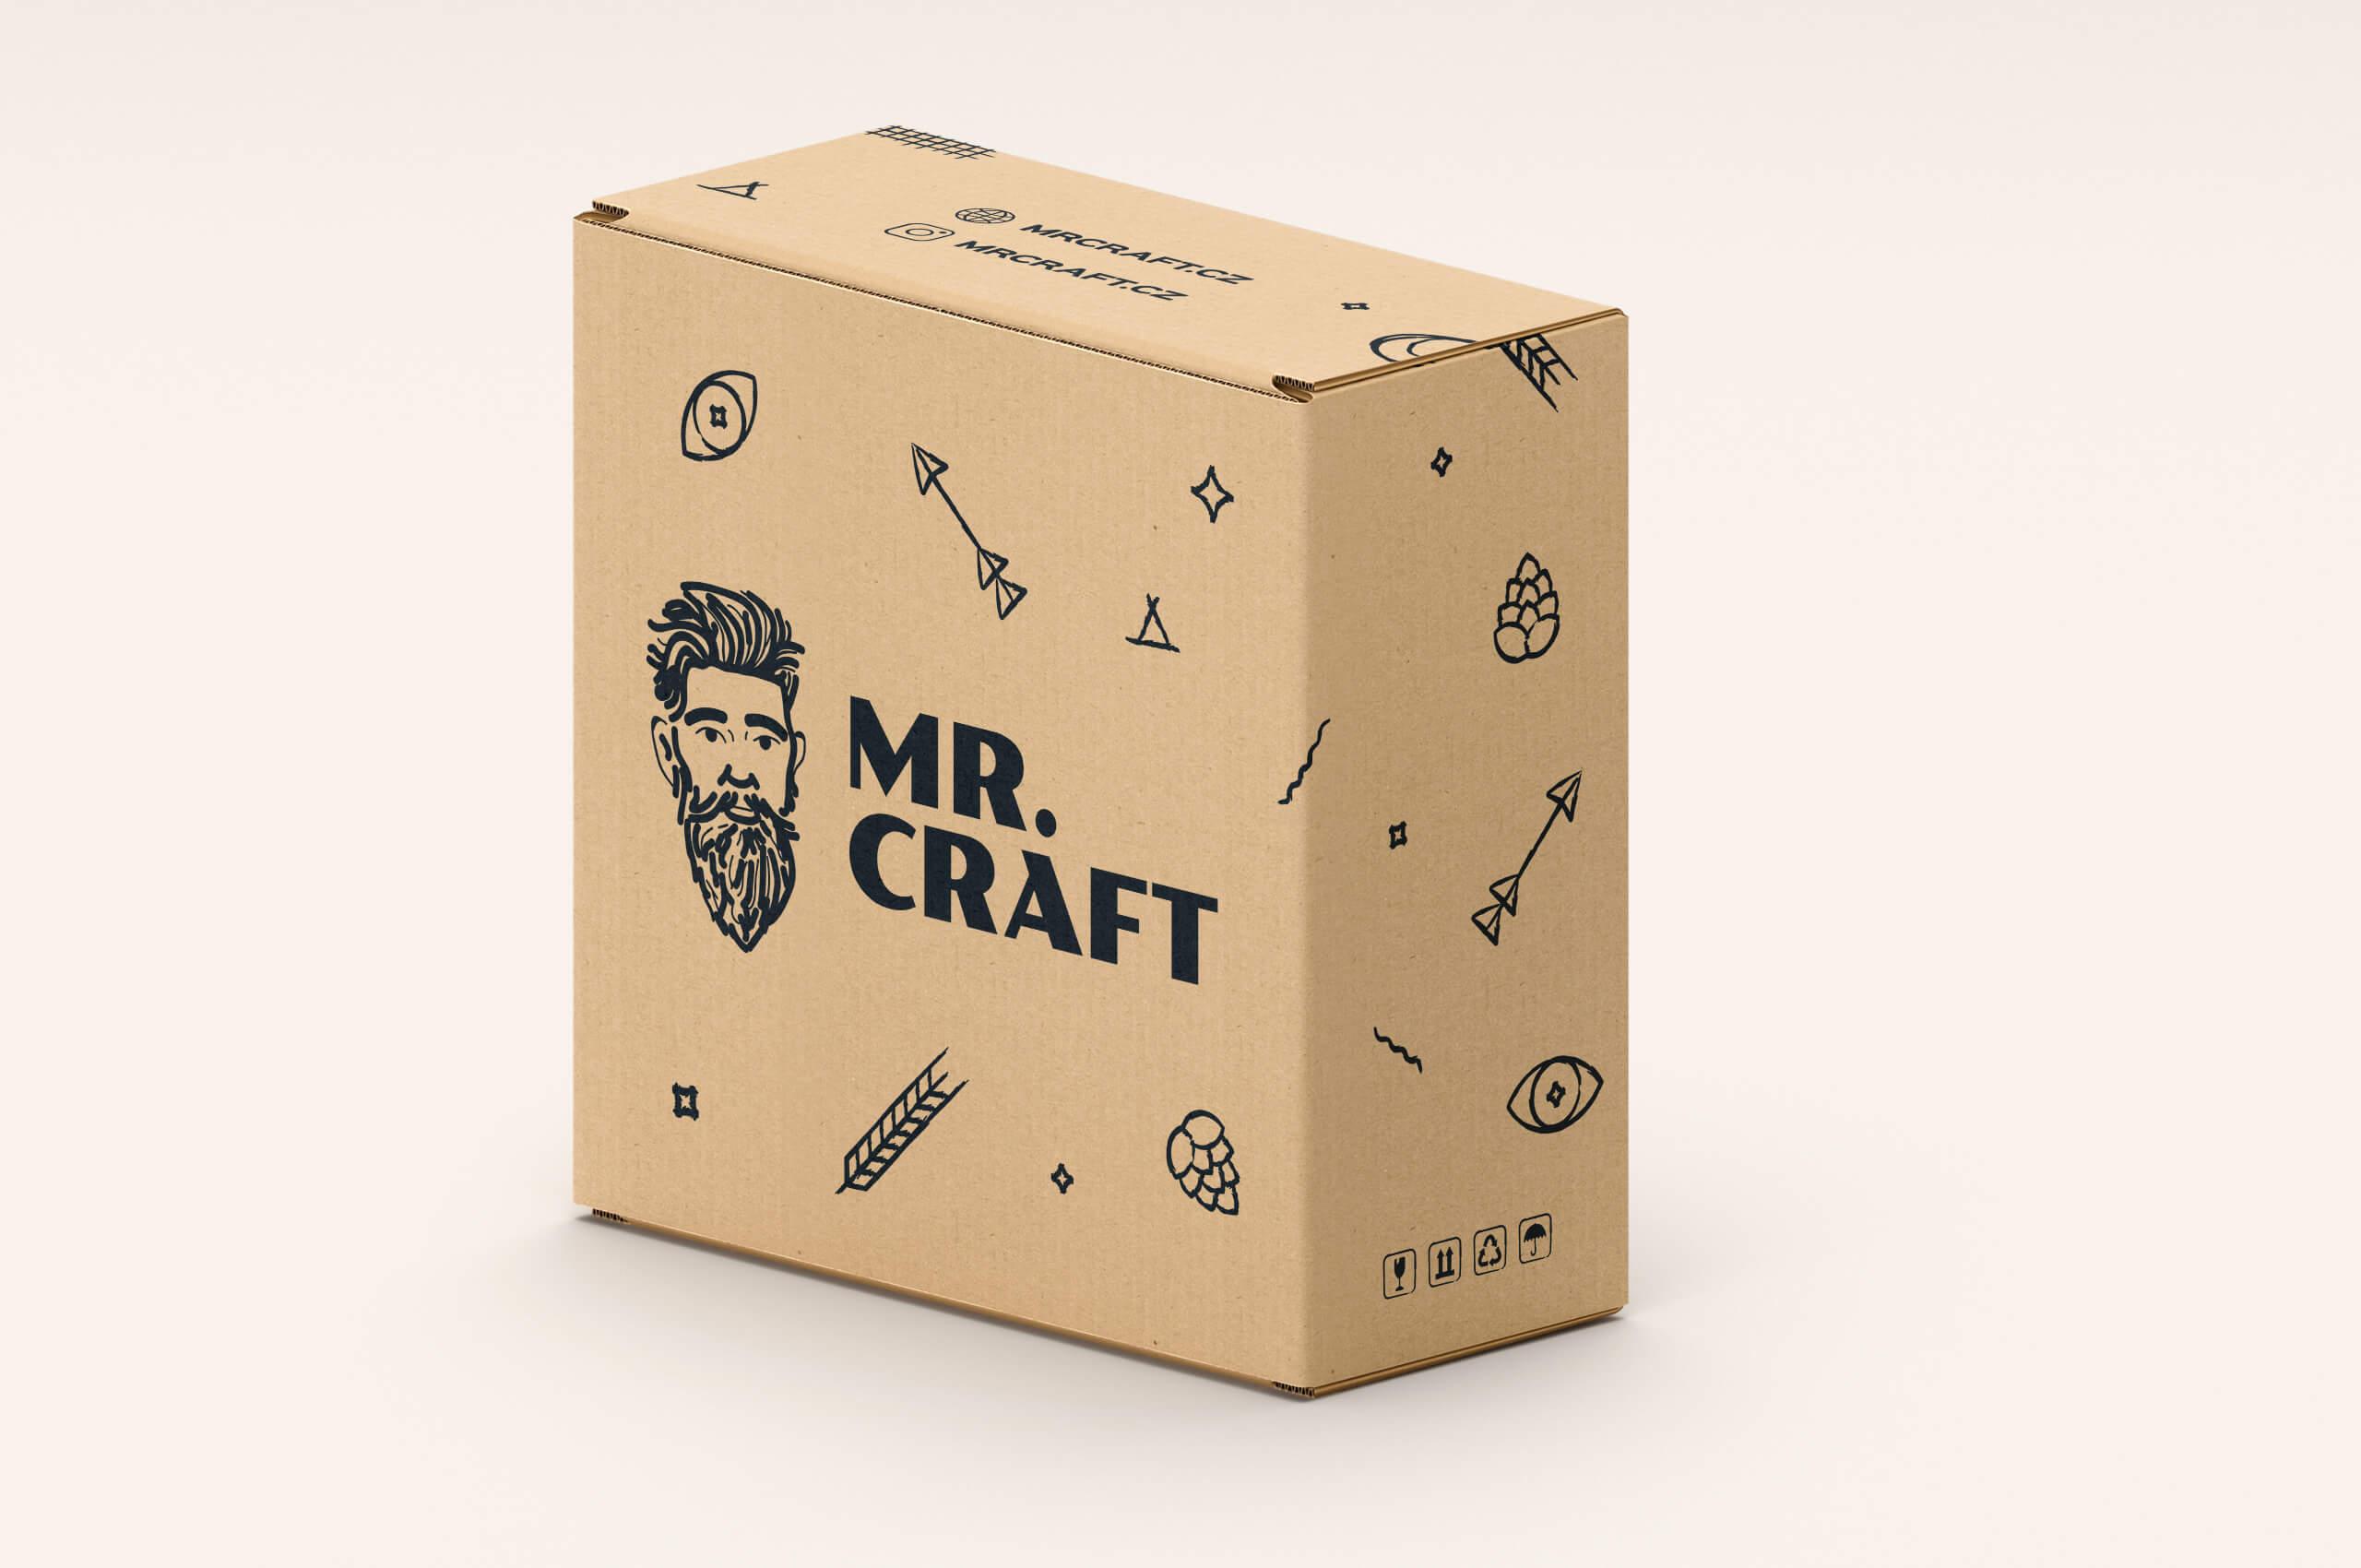 mrcraft-export-2021-2-comp